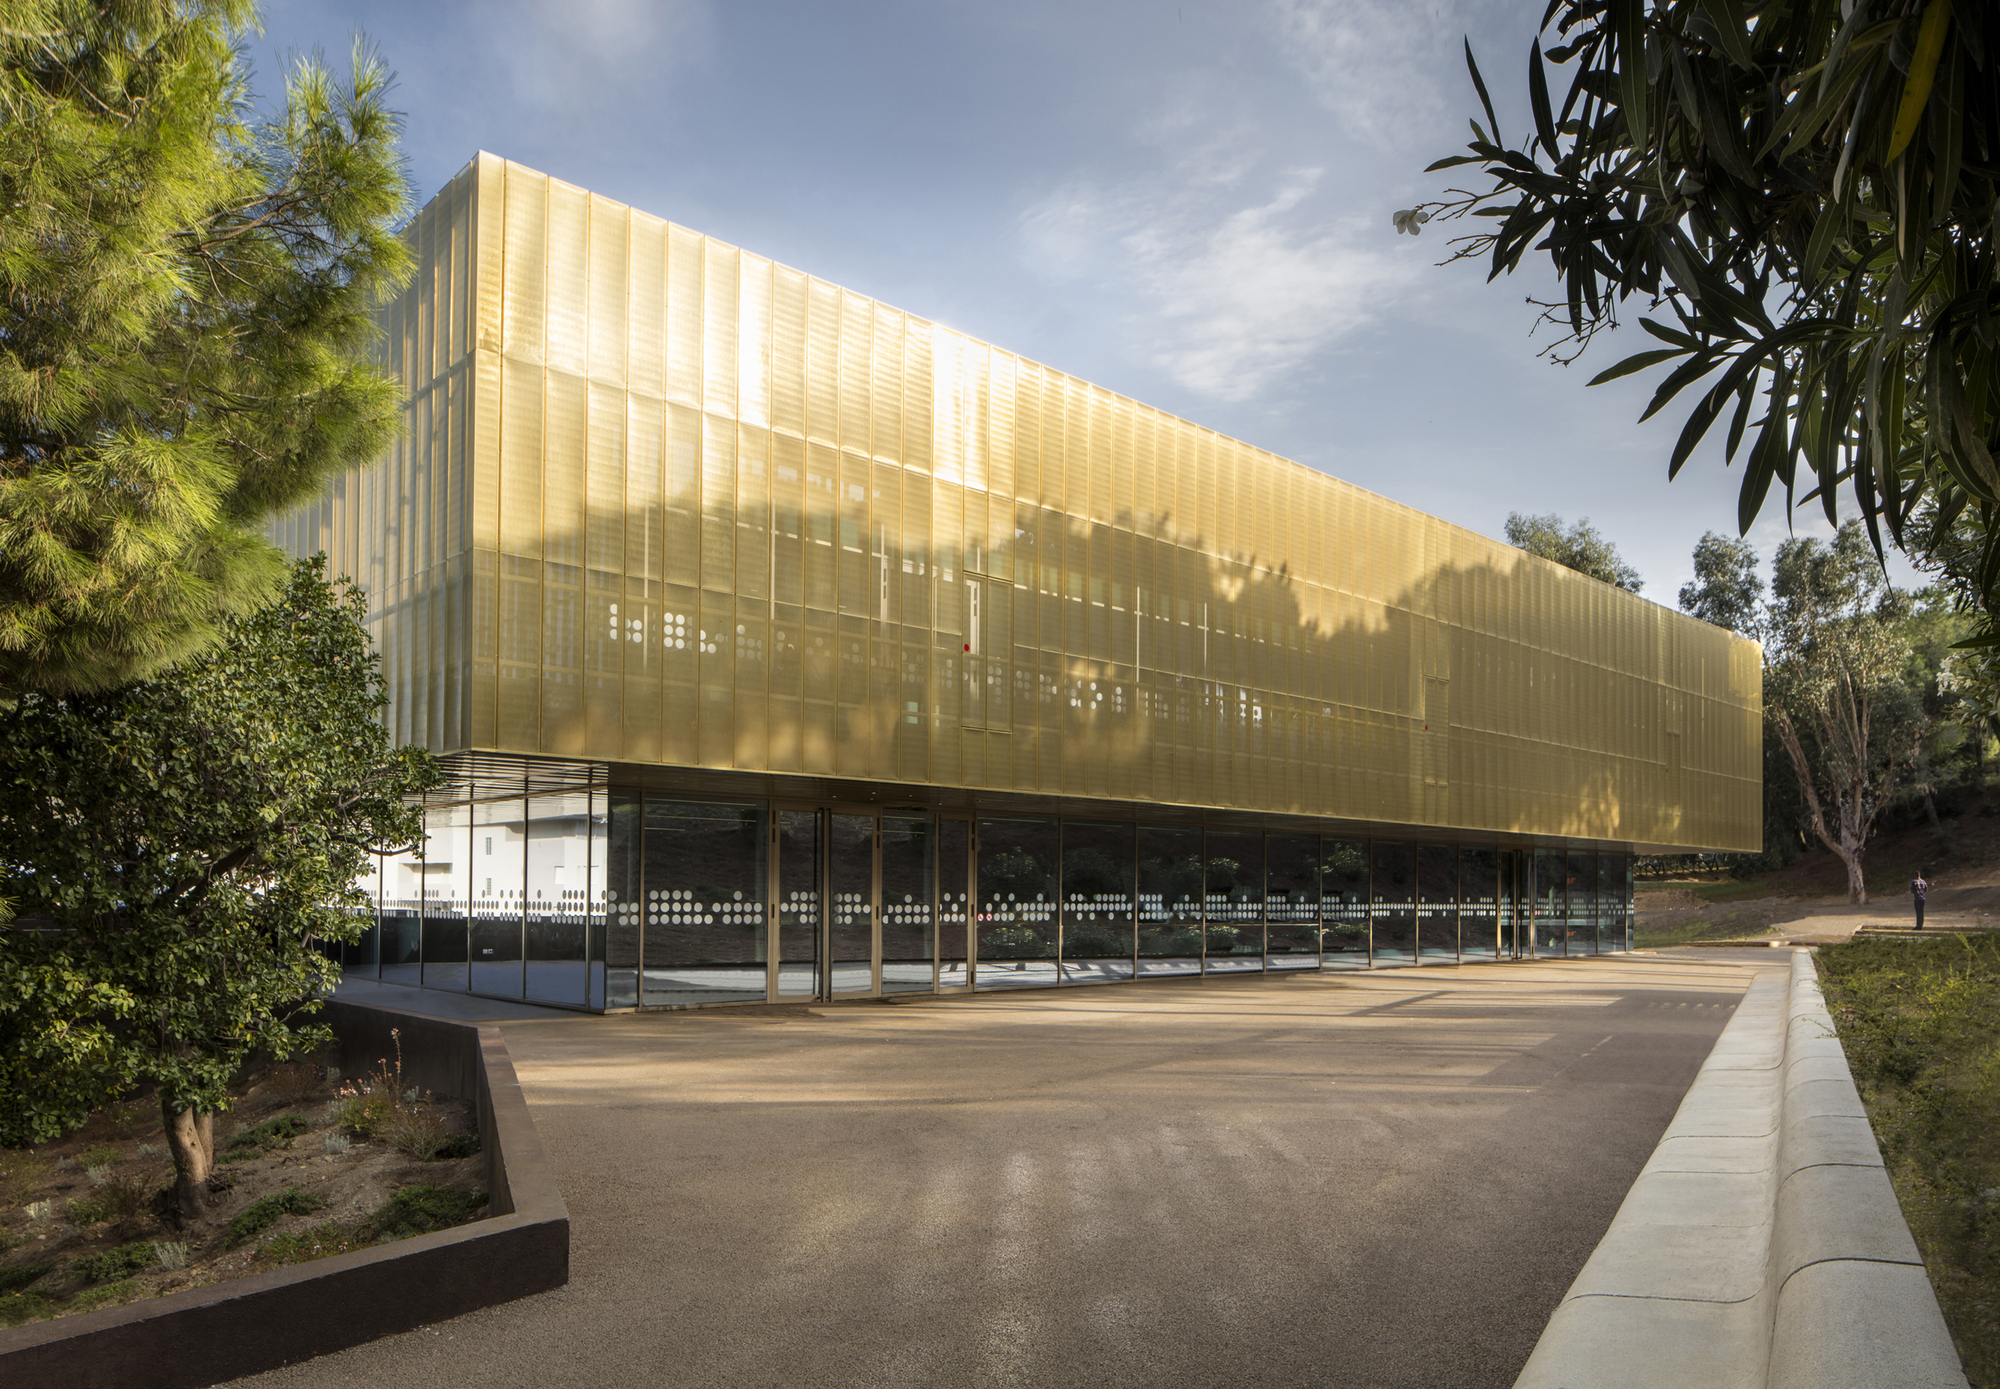 centro cultural alb 39 oru devaux devaux architectes atel 39 erarchitecture archdaily brasil. Black Bedroom Furniture Sets. Home Design Ideas